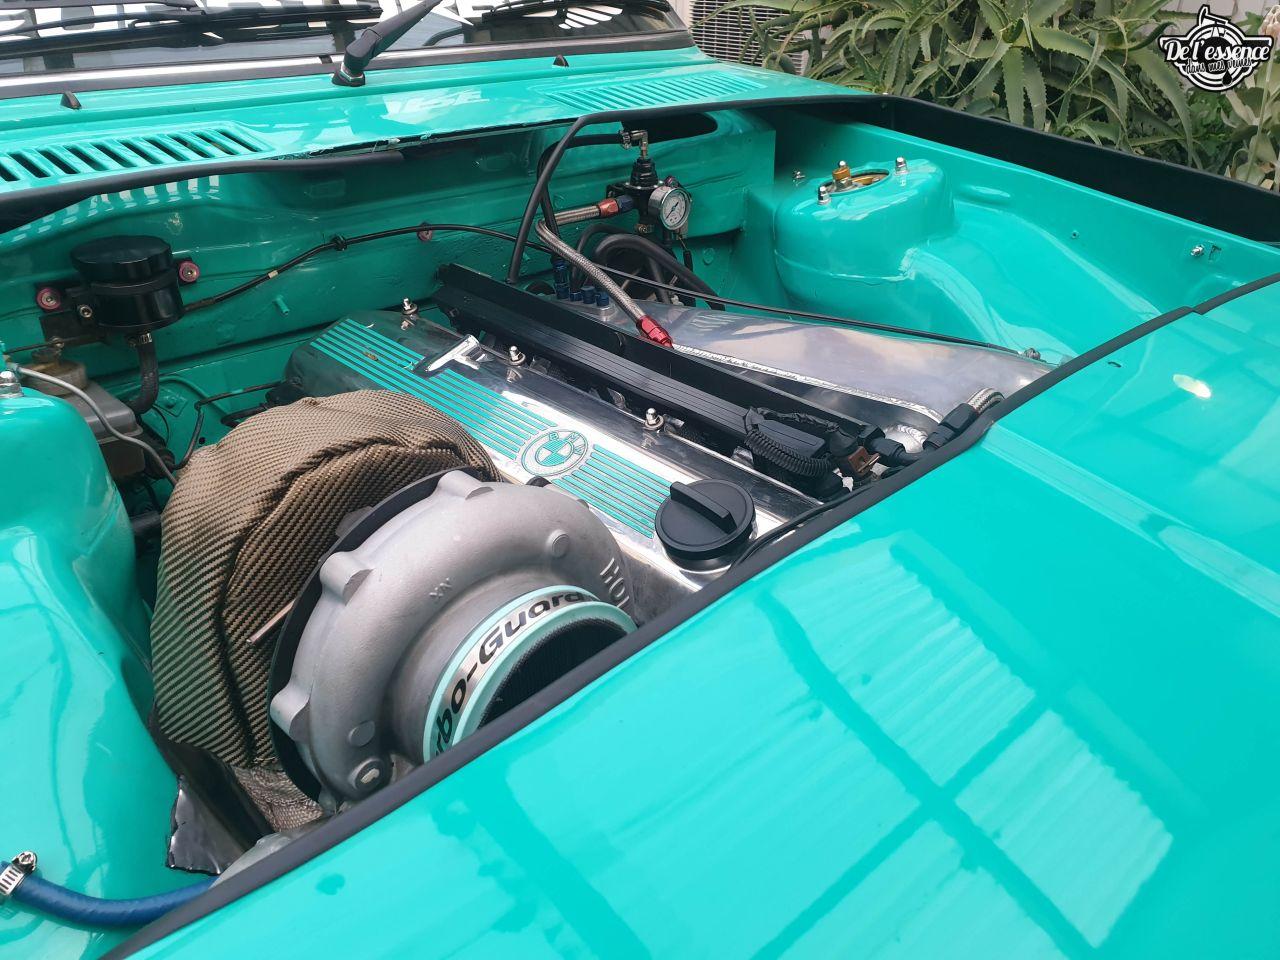 La BMW E21 325i Turbo de Corrie - Requin (très) pressé ! 24